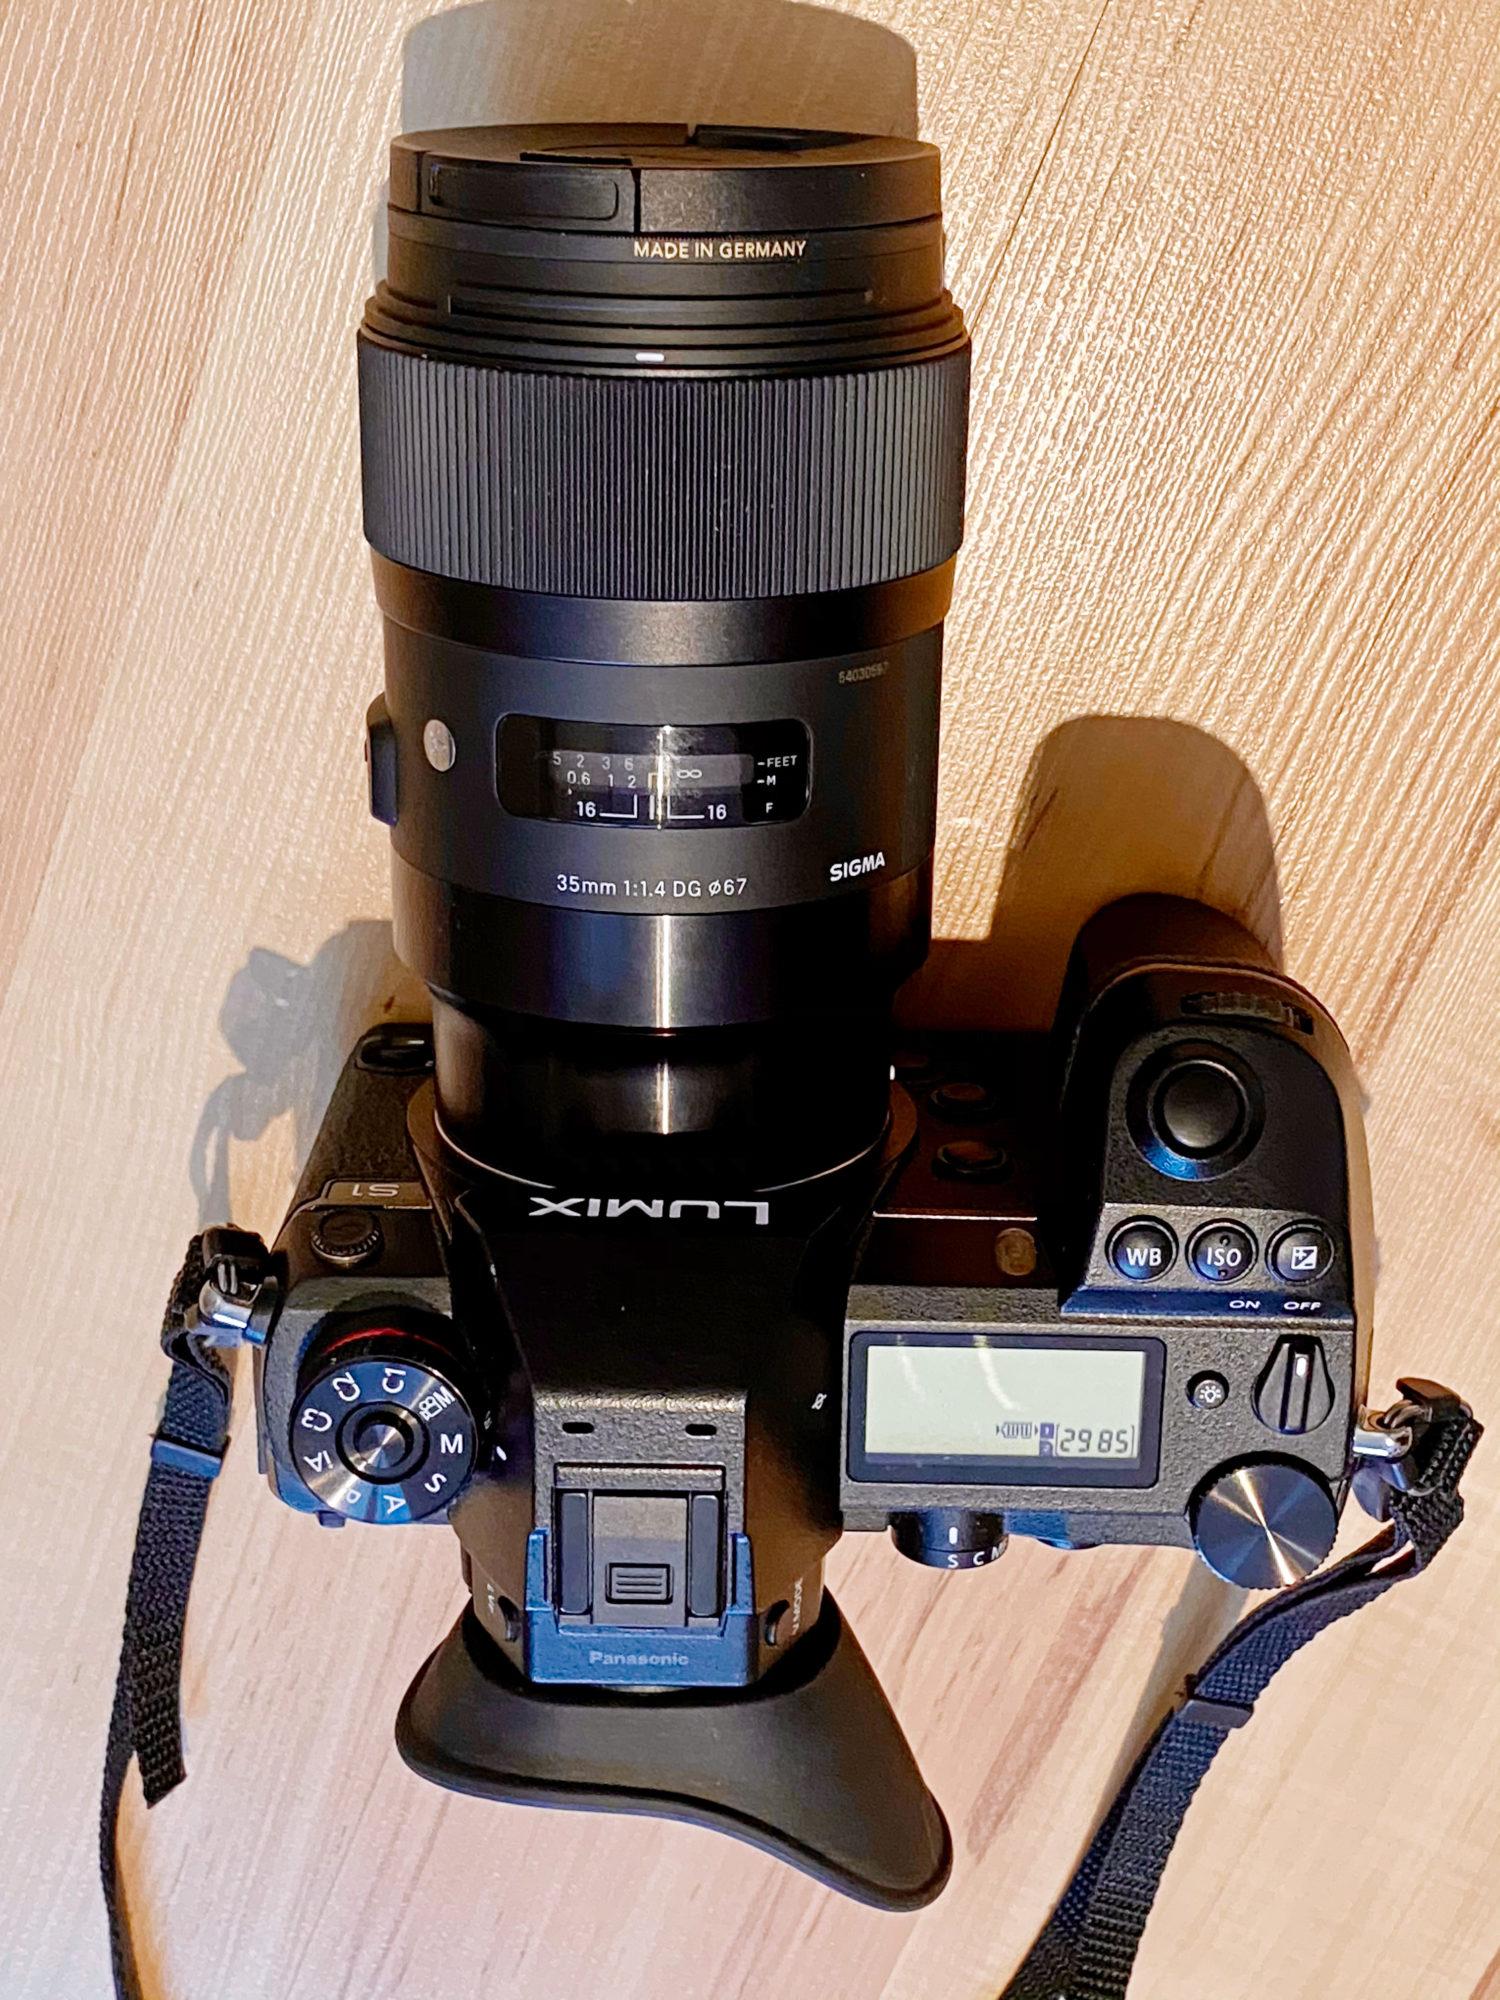 Panasonic Lumix S1 mit Sigma 35mm F1,4 DG HSM